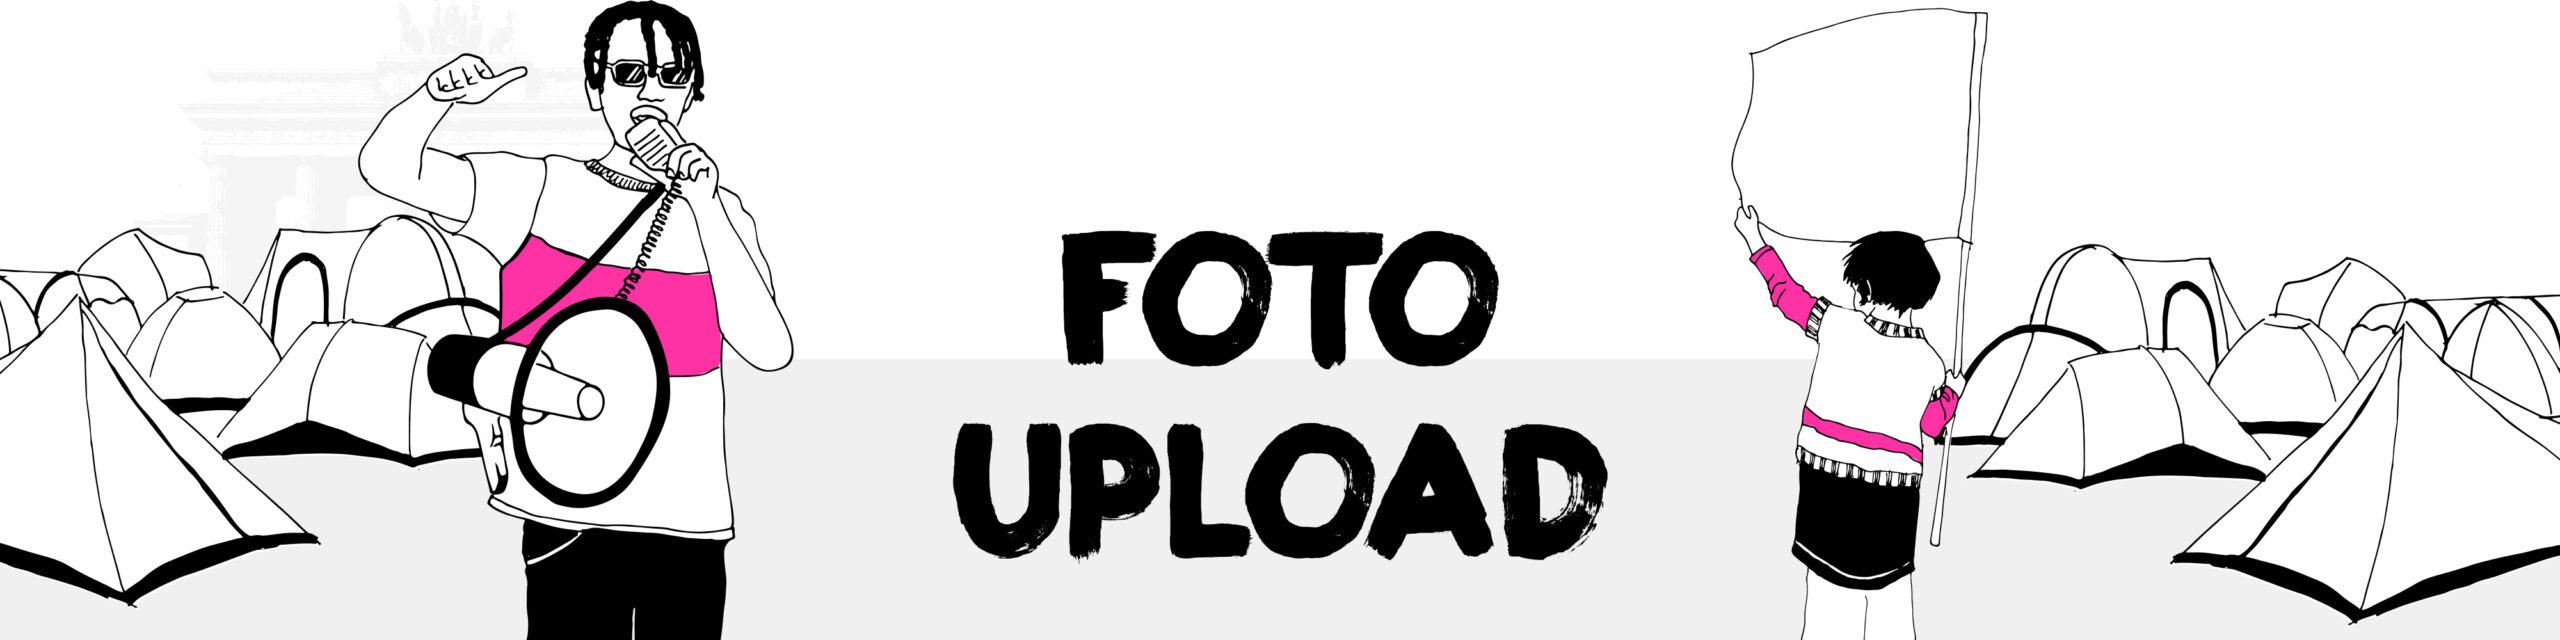 media-fotoupload-header